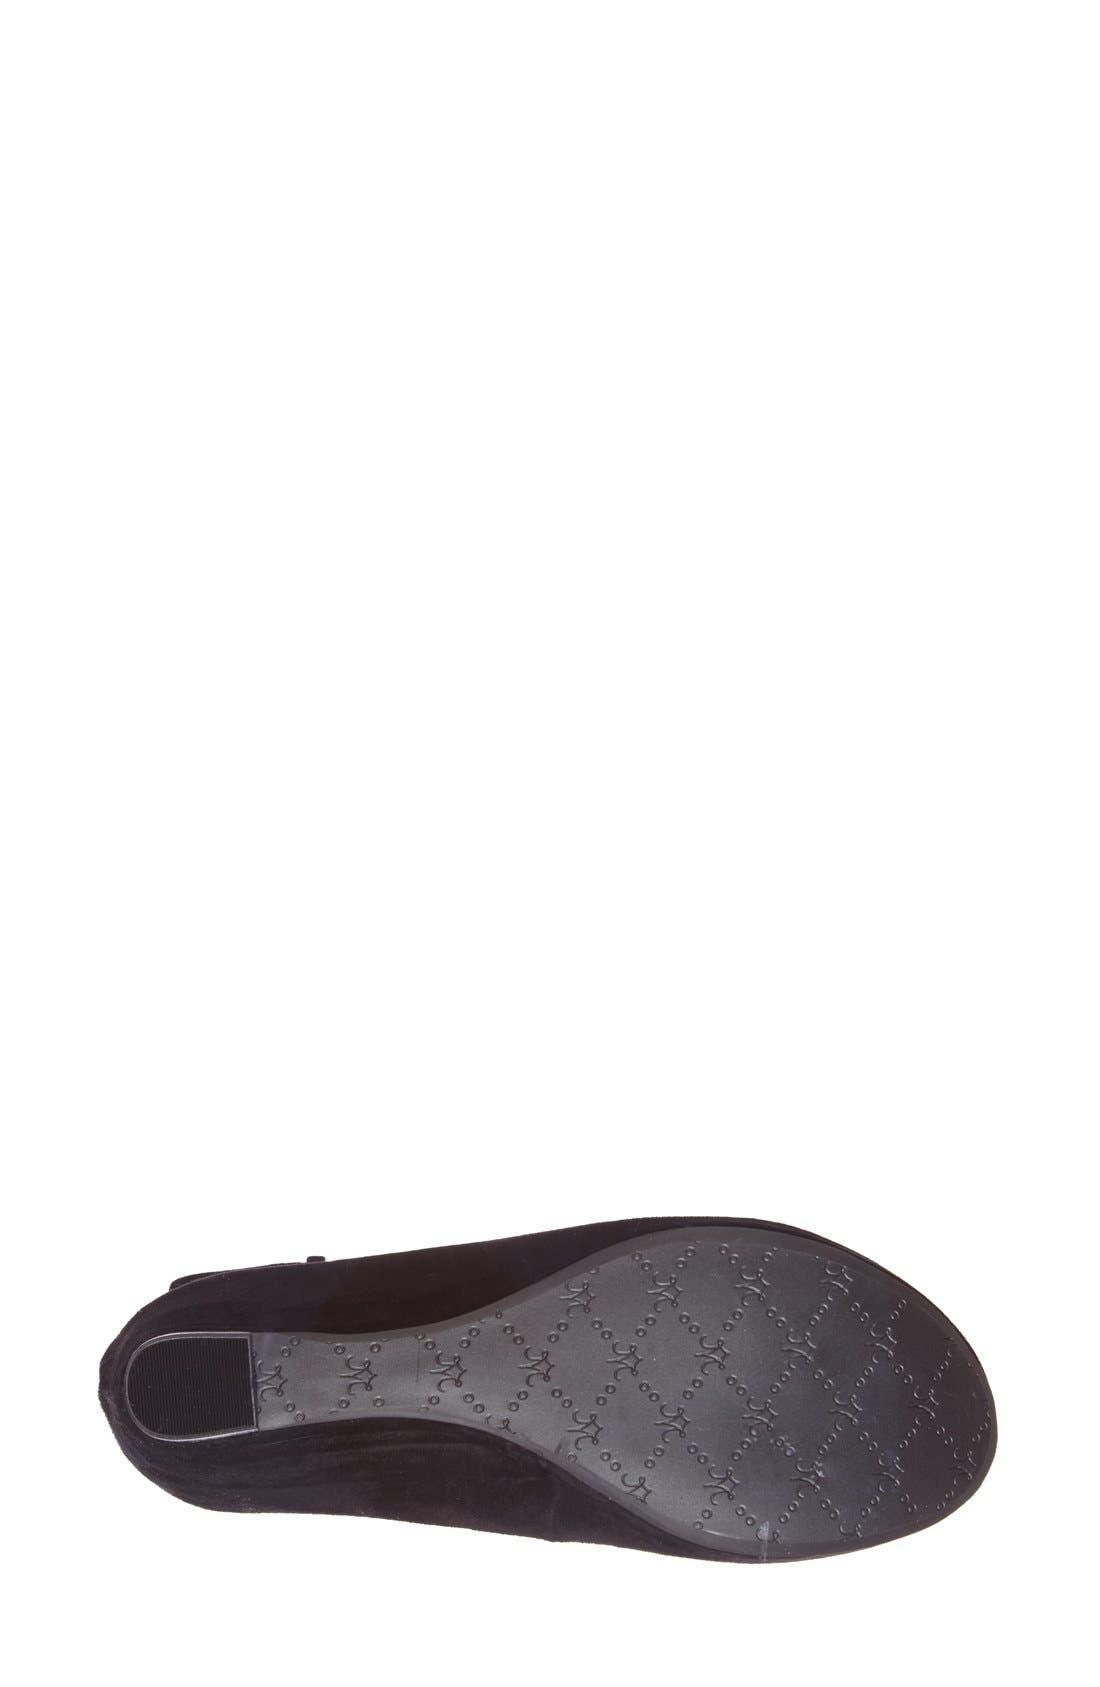 'Tricia' Ankle Strap Sandal,                             Alternate thumbnail 55, color,